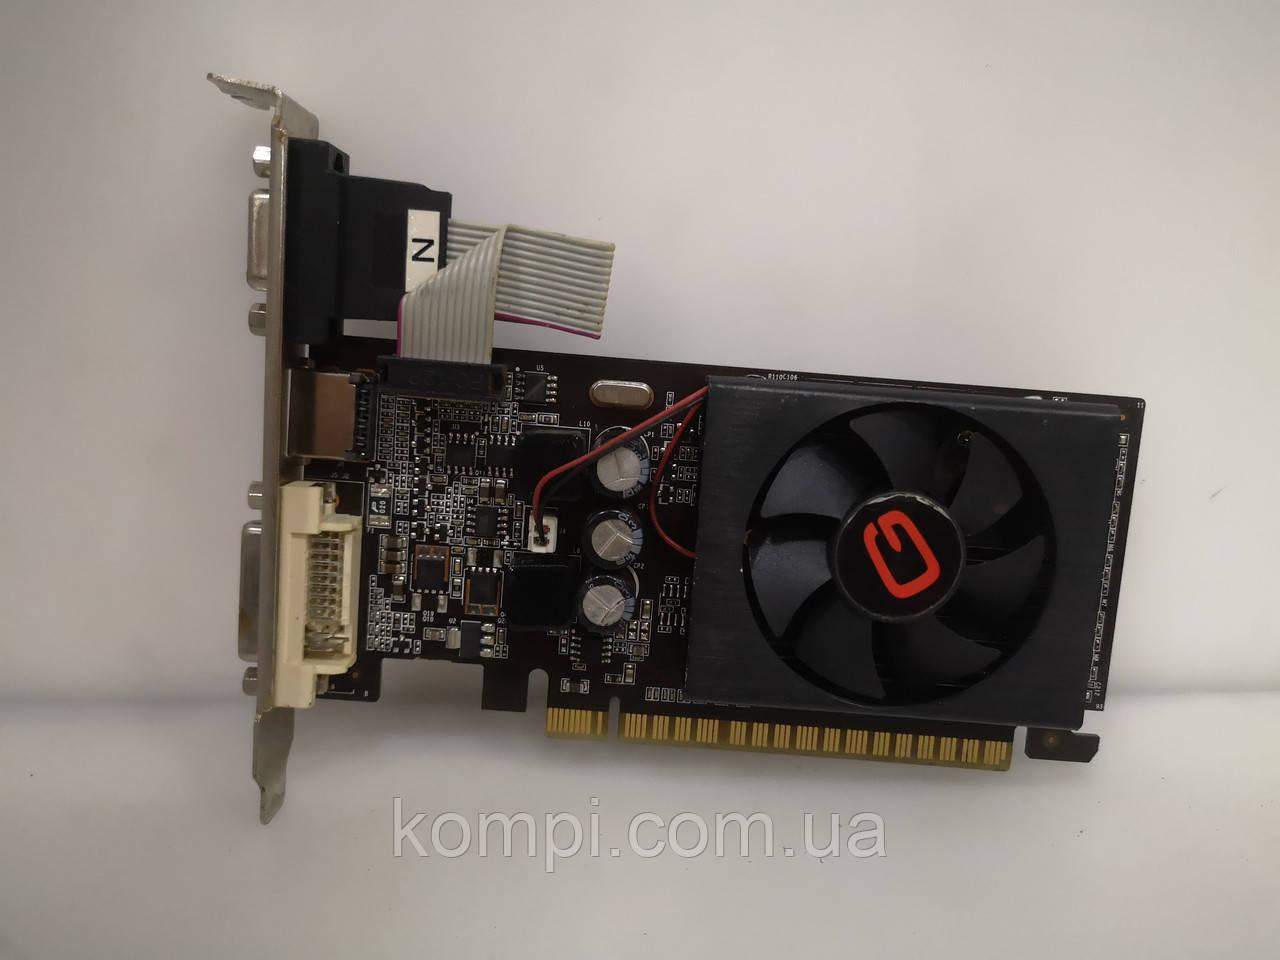 Видеокарта Nvidia GT 610 2GB  PCI-E